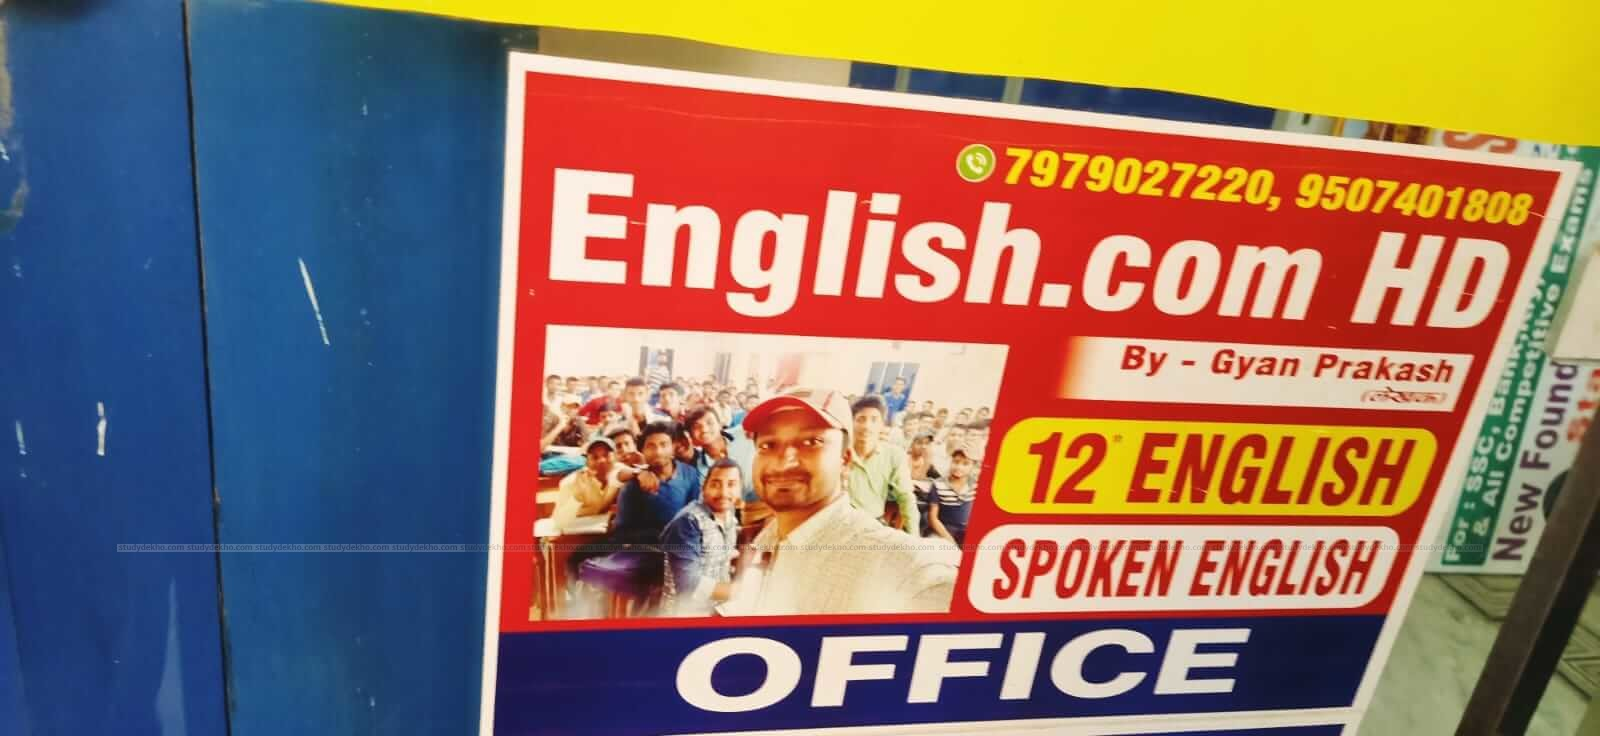 ENGLISH.COM Gallery